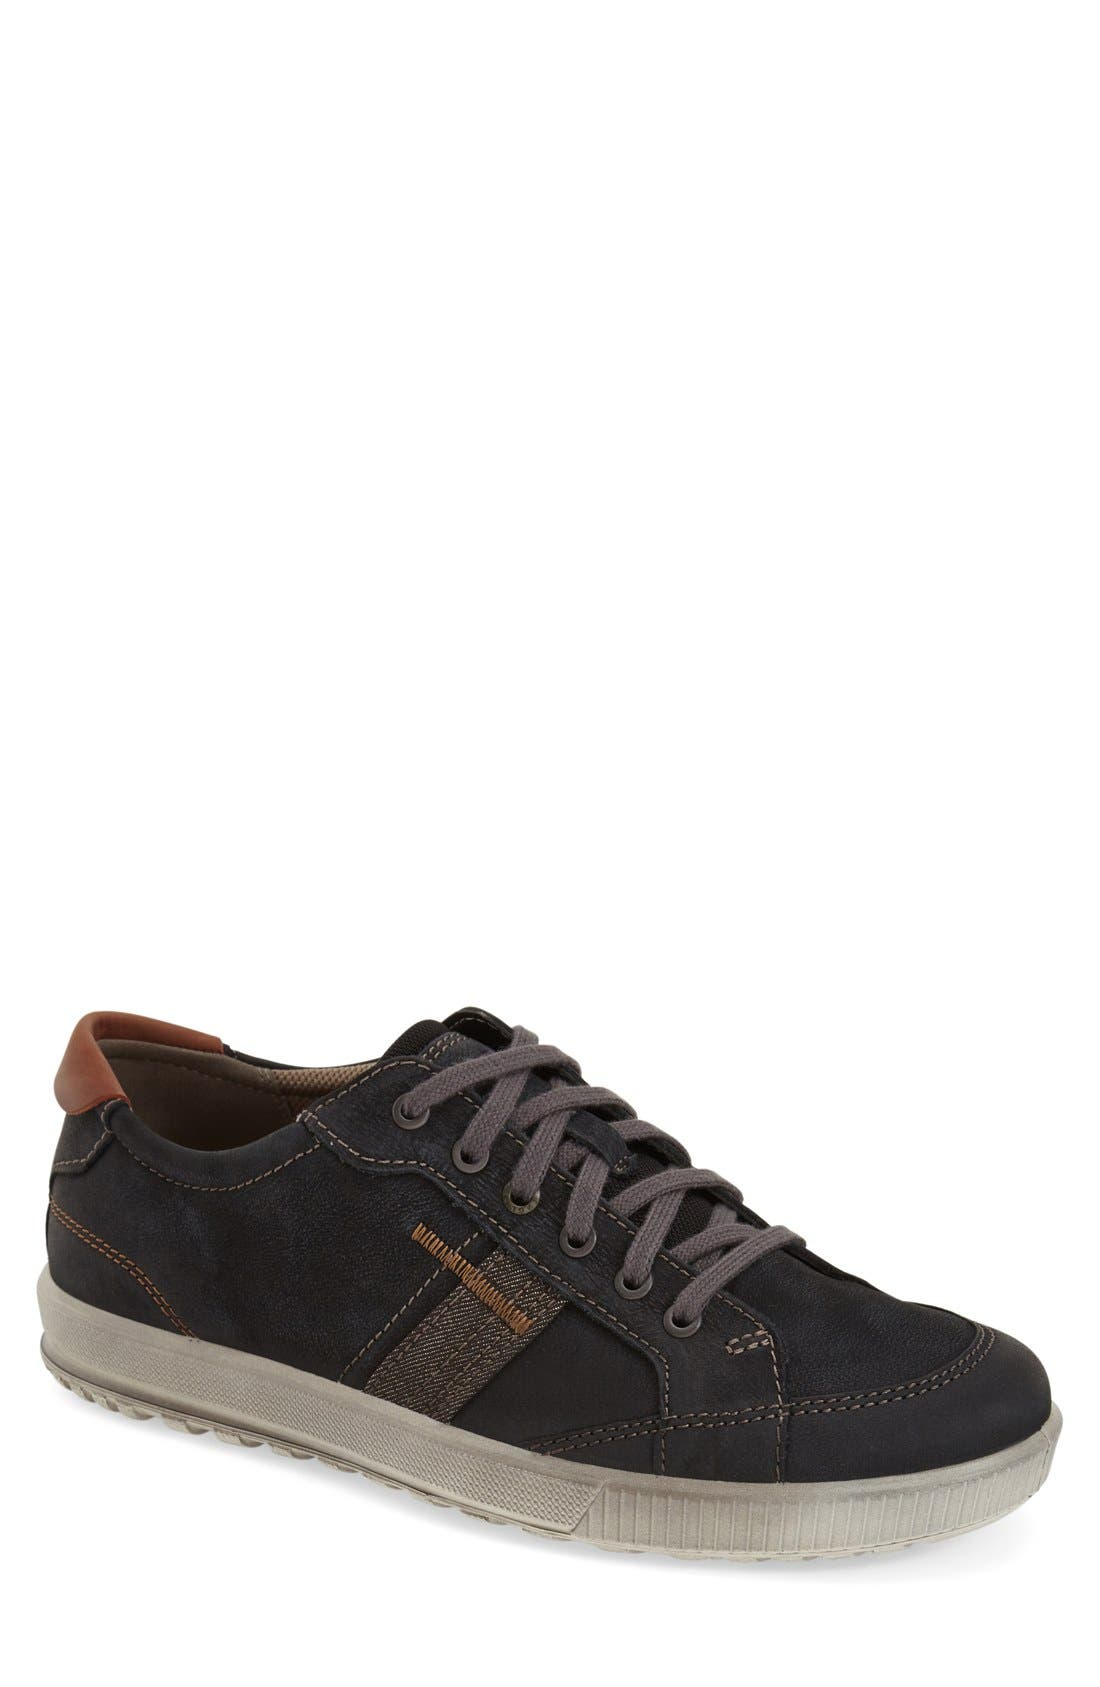 Main Image - ECCO 'Ennio Retro' Sneaker (Men)